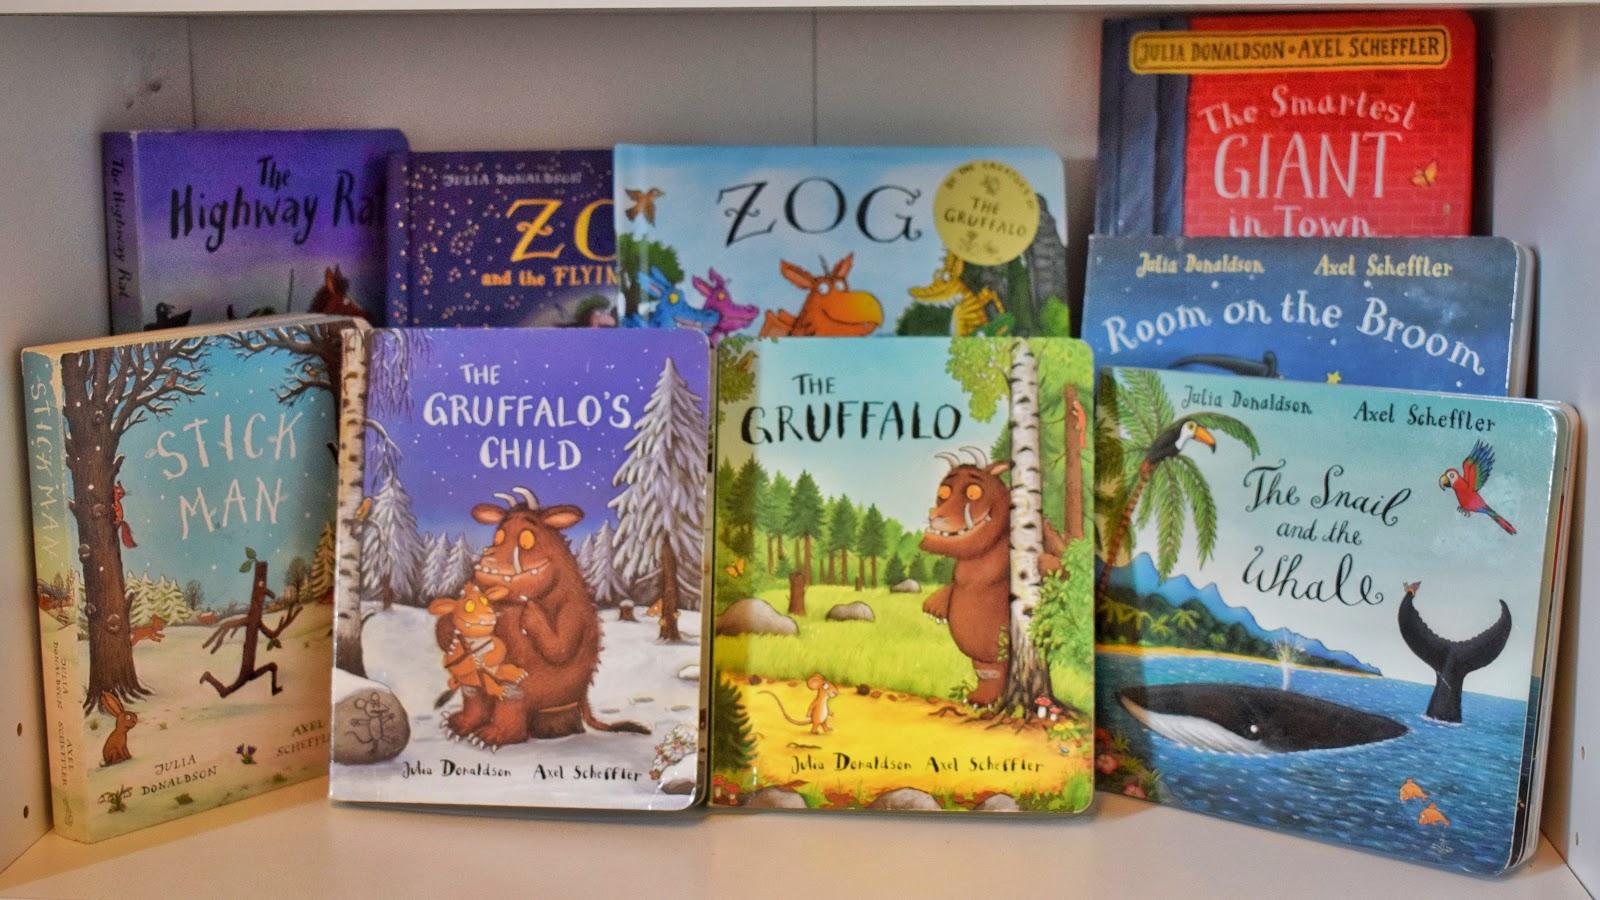 Top Reads For Tots | A World Book Day Special, 9TvuvSQHGSVSFXrDiTkAqWR881aJwfZySkBUHmDi4oO075geLe33Jqg448SMlCsMpCNQy2Pbg8PH3eTXa3xDLlBXg93QJWmYxX1GpXXLG51ZqaGugd7STXBmEmpOOriISuJmx2oN%, daily-dad, product-review, 4-5, 2-3, 0-1%